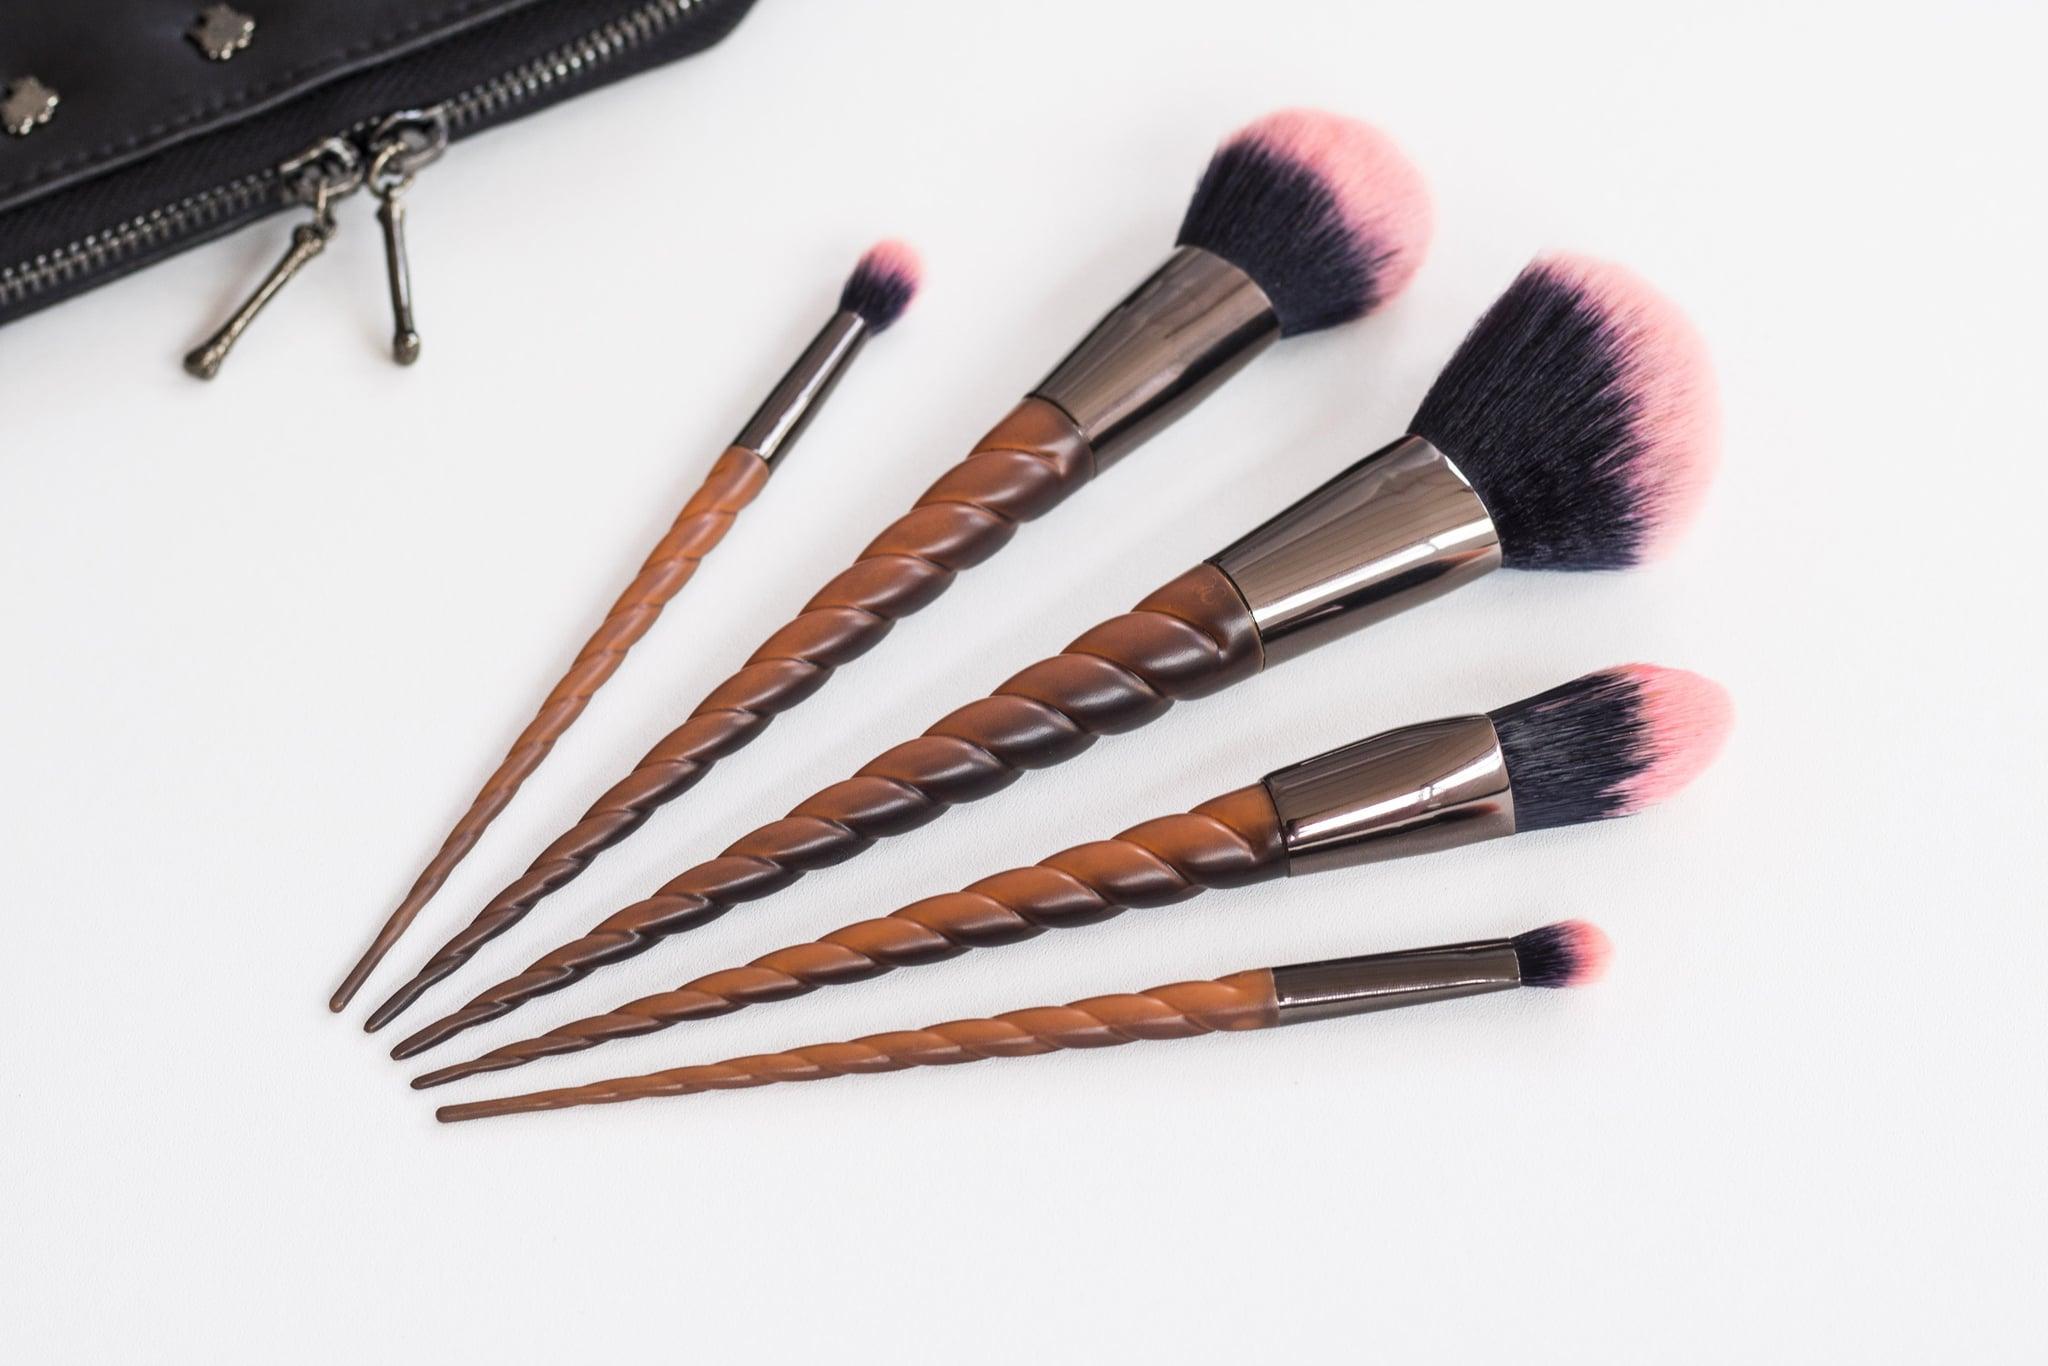 Unicorn Cosmetics Halloween Makeup Brushes | POPSUGAR ...